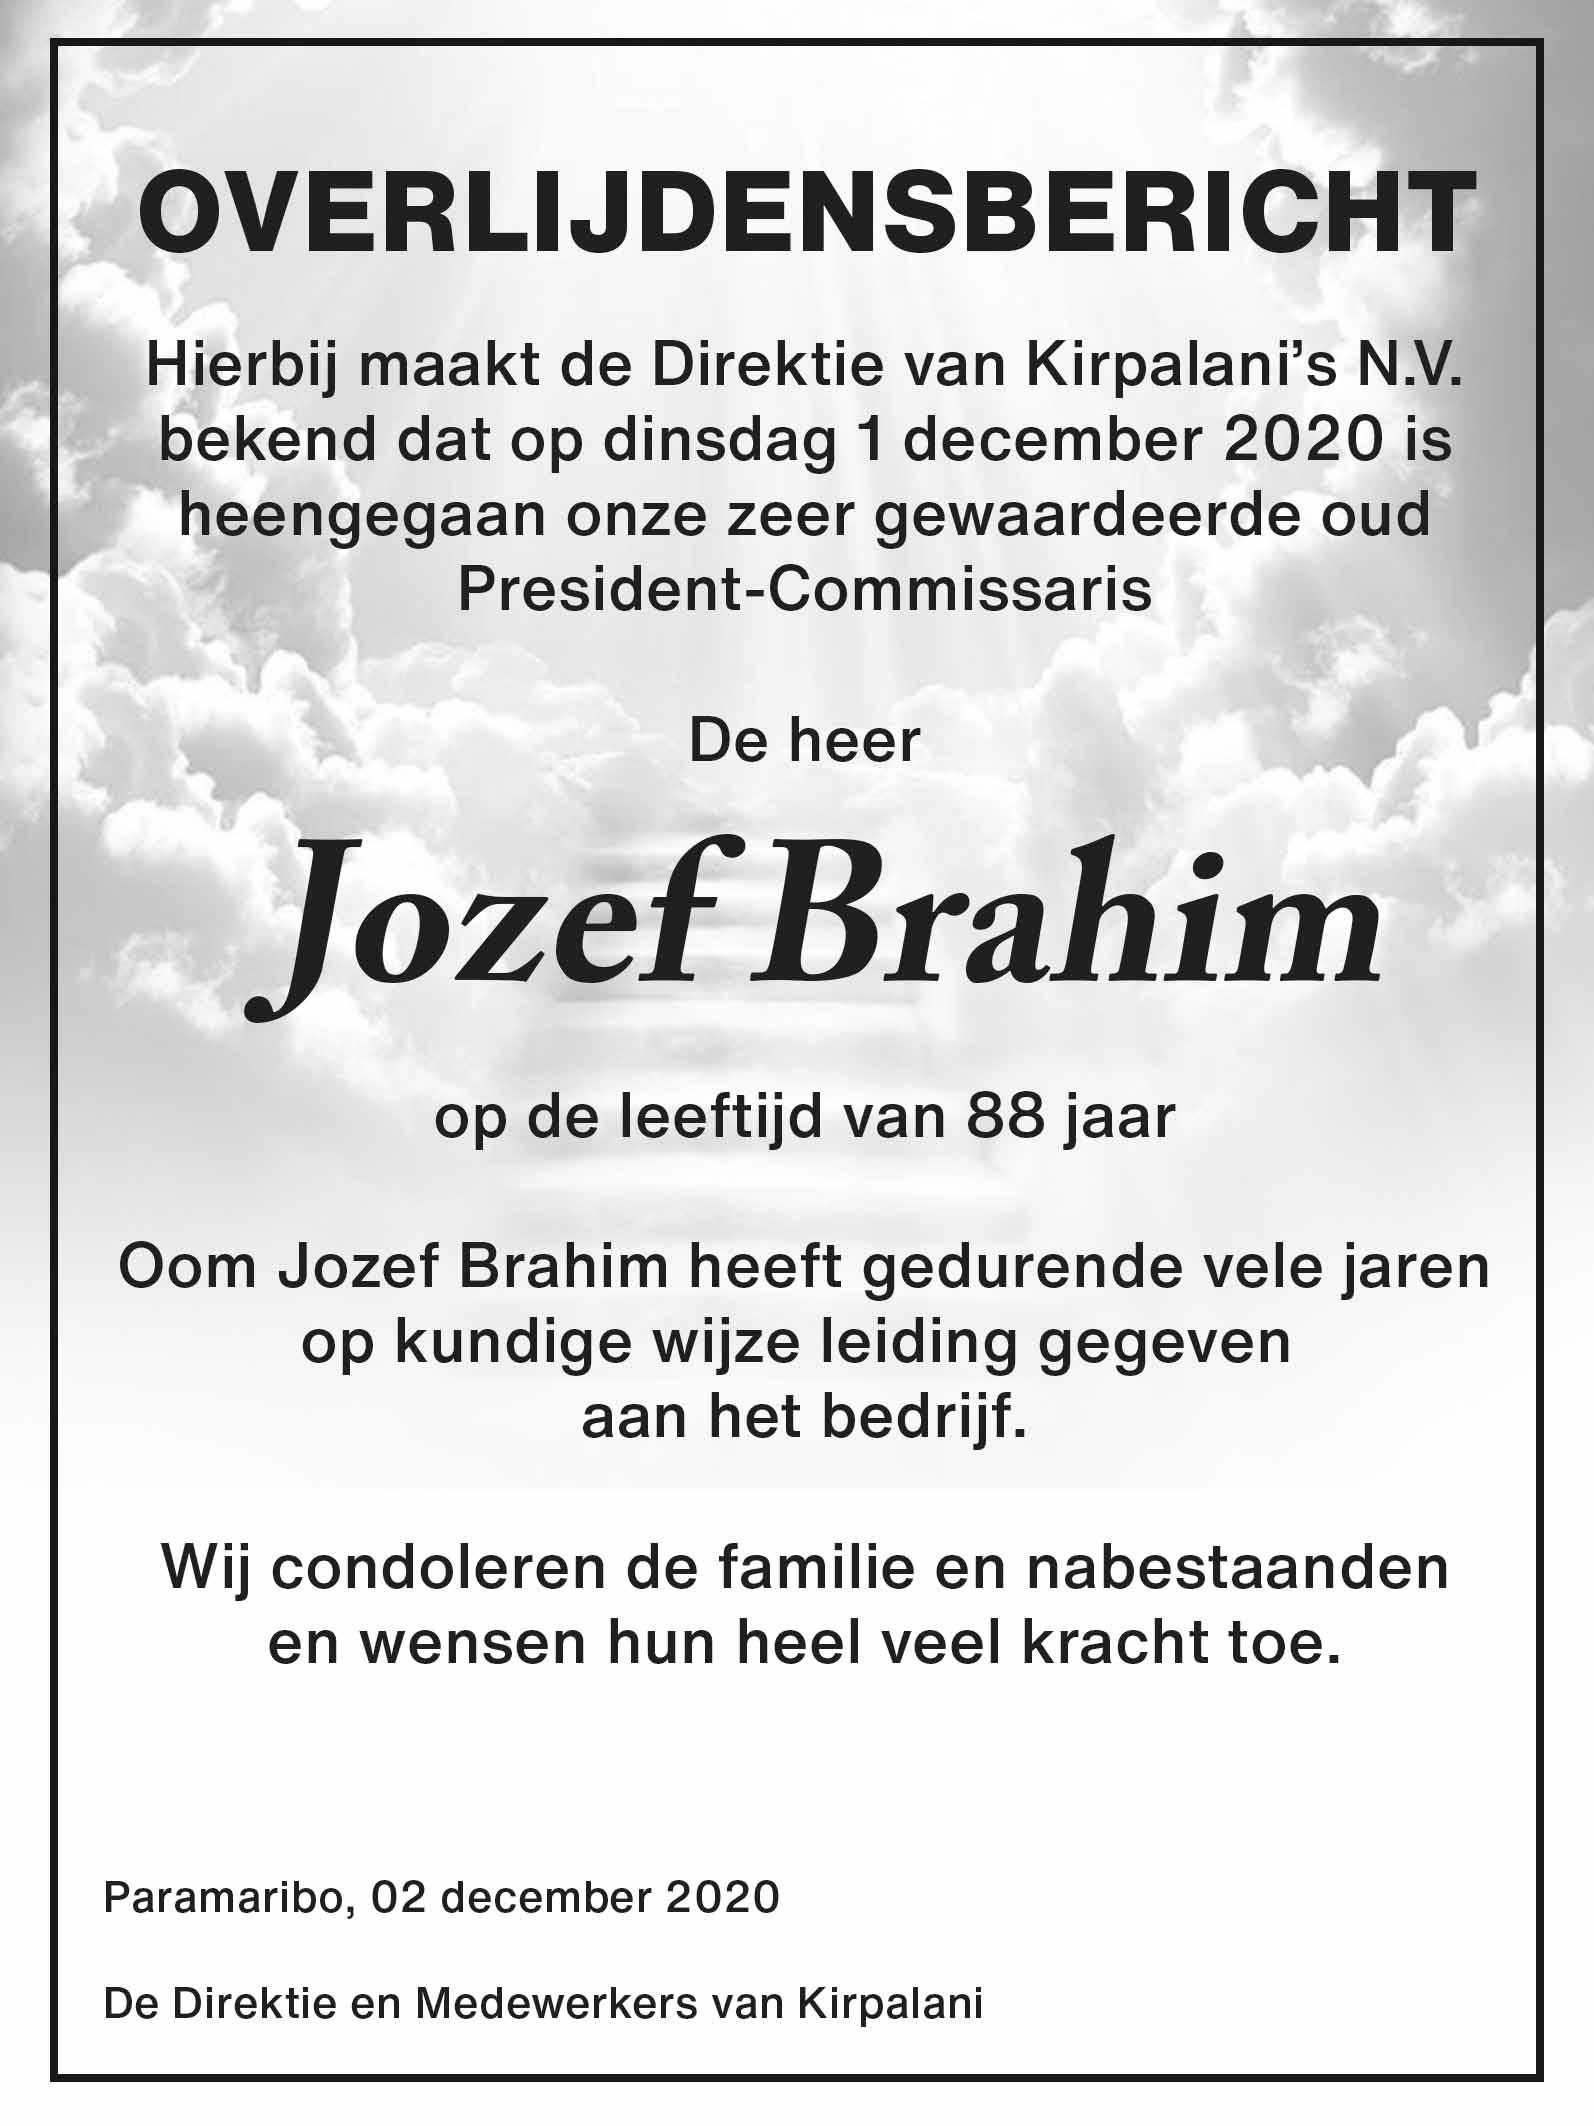 Brahim DSB Suriname